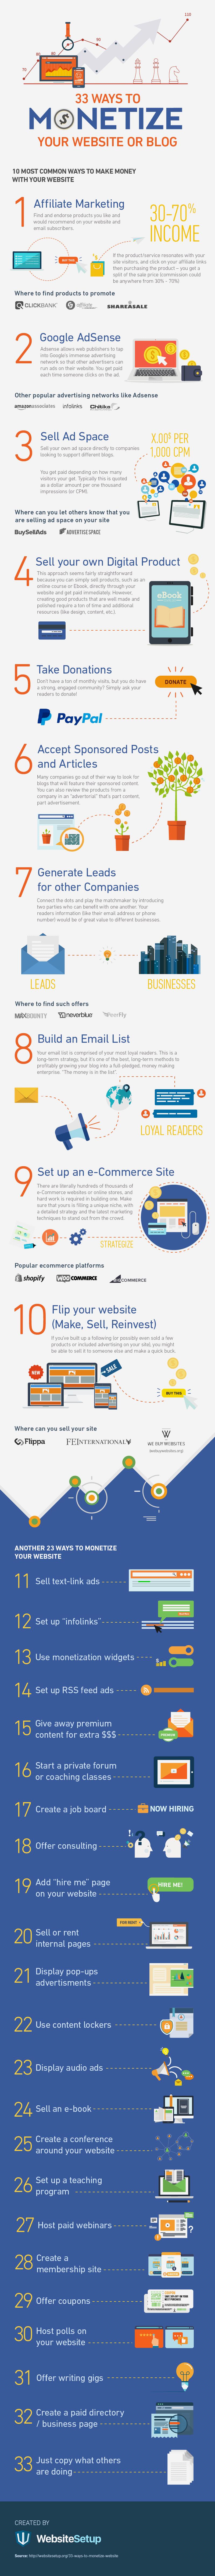 33 Ways to Monetise your WordPress Website or Blog